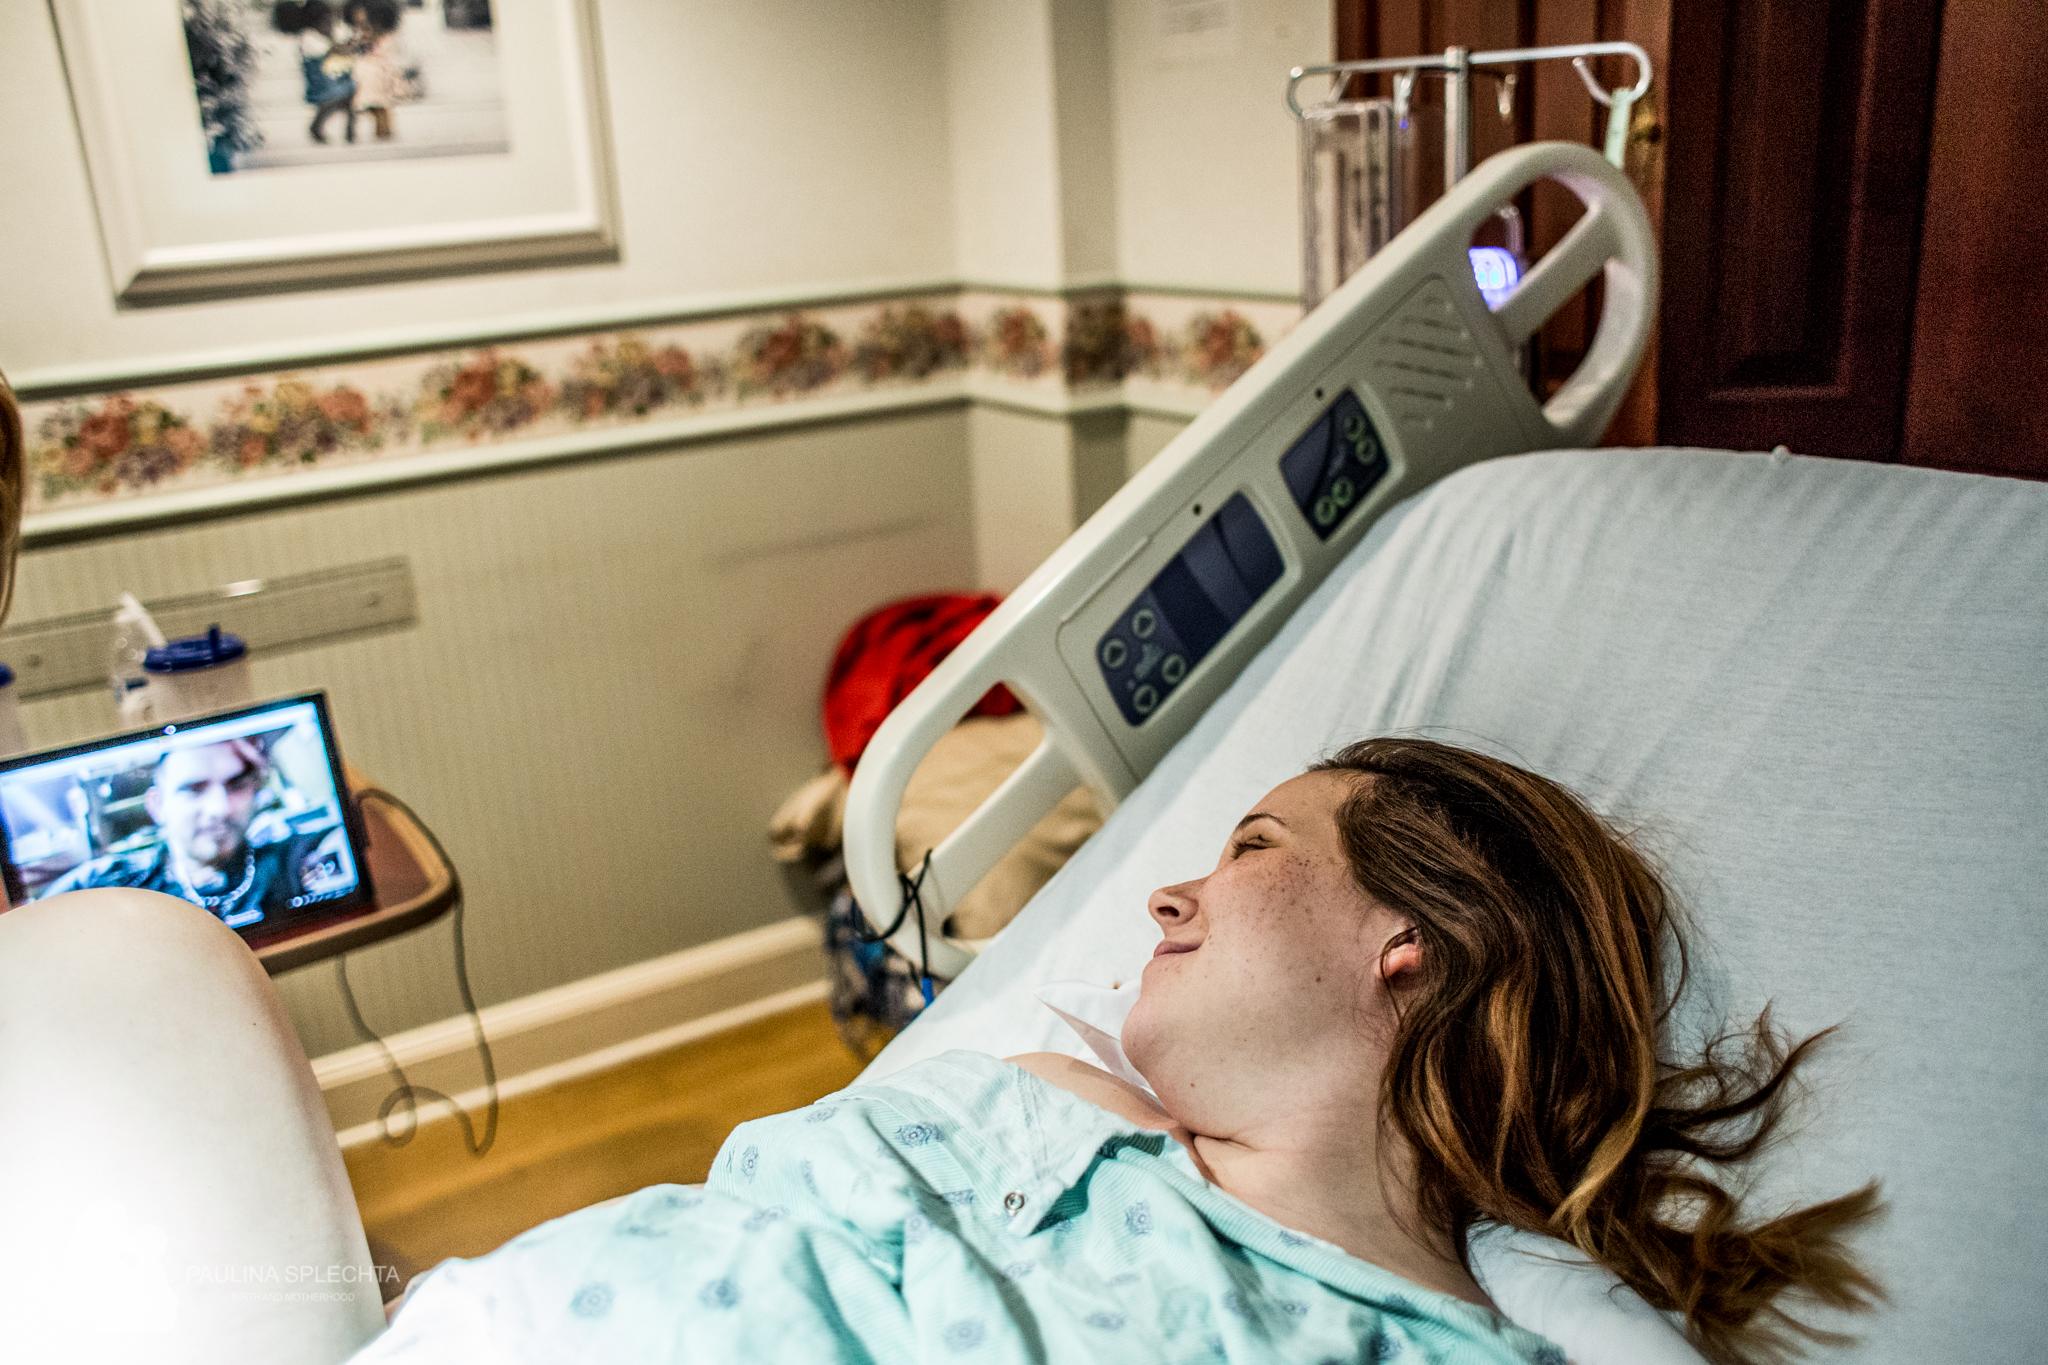 dr skeete best obgyn in south florida fort lauderdale broward general hospital dr delisa skeete henry plantation_-5.jpg